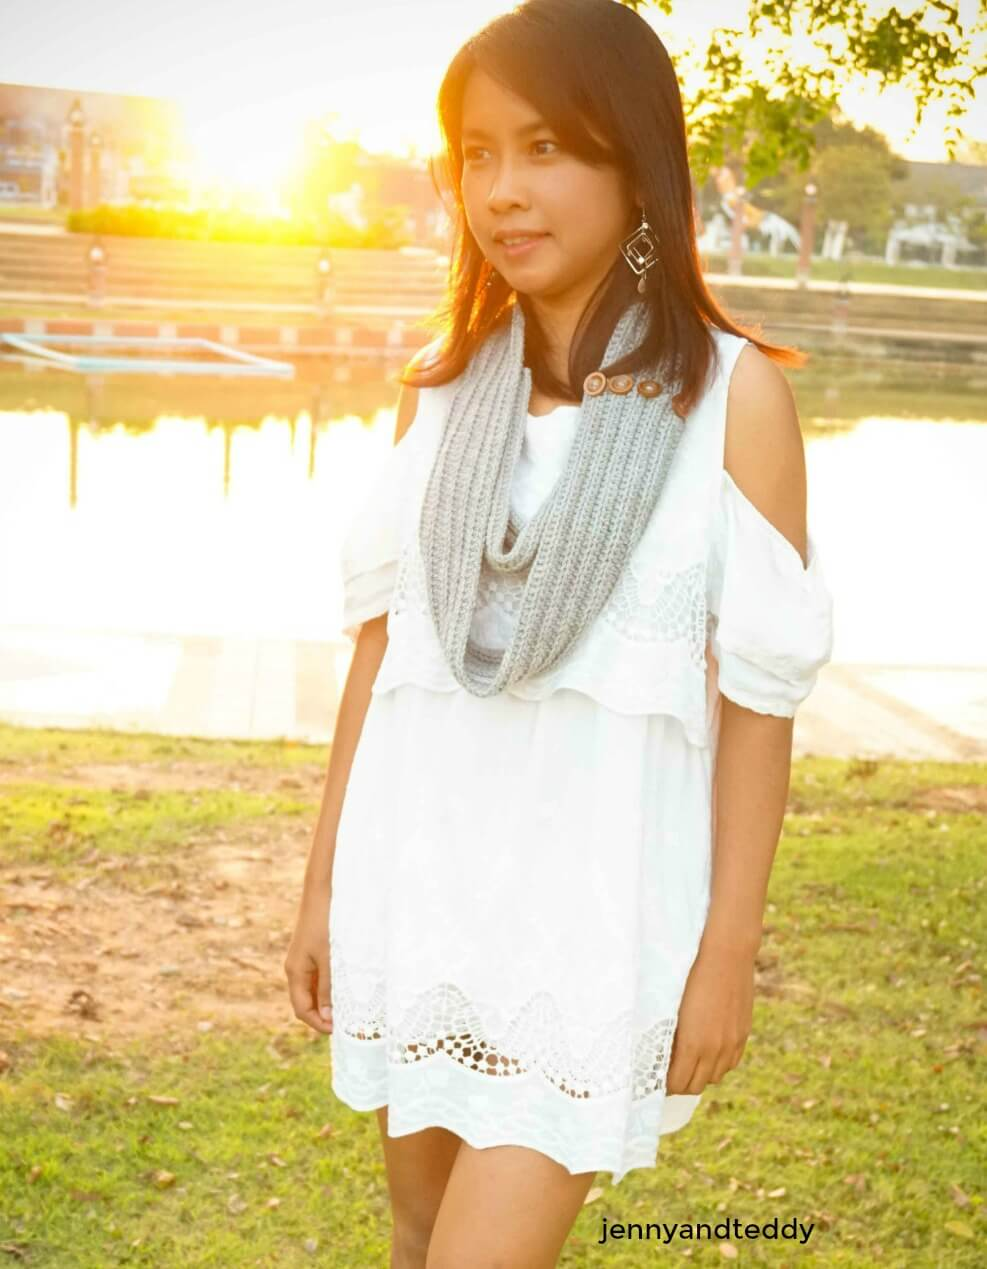 c how to crochet infinity scarf for beginner